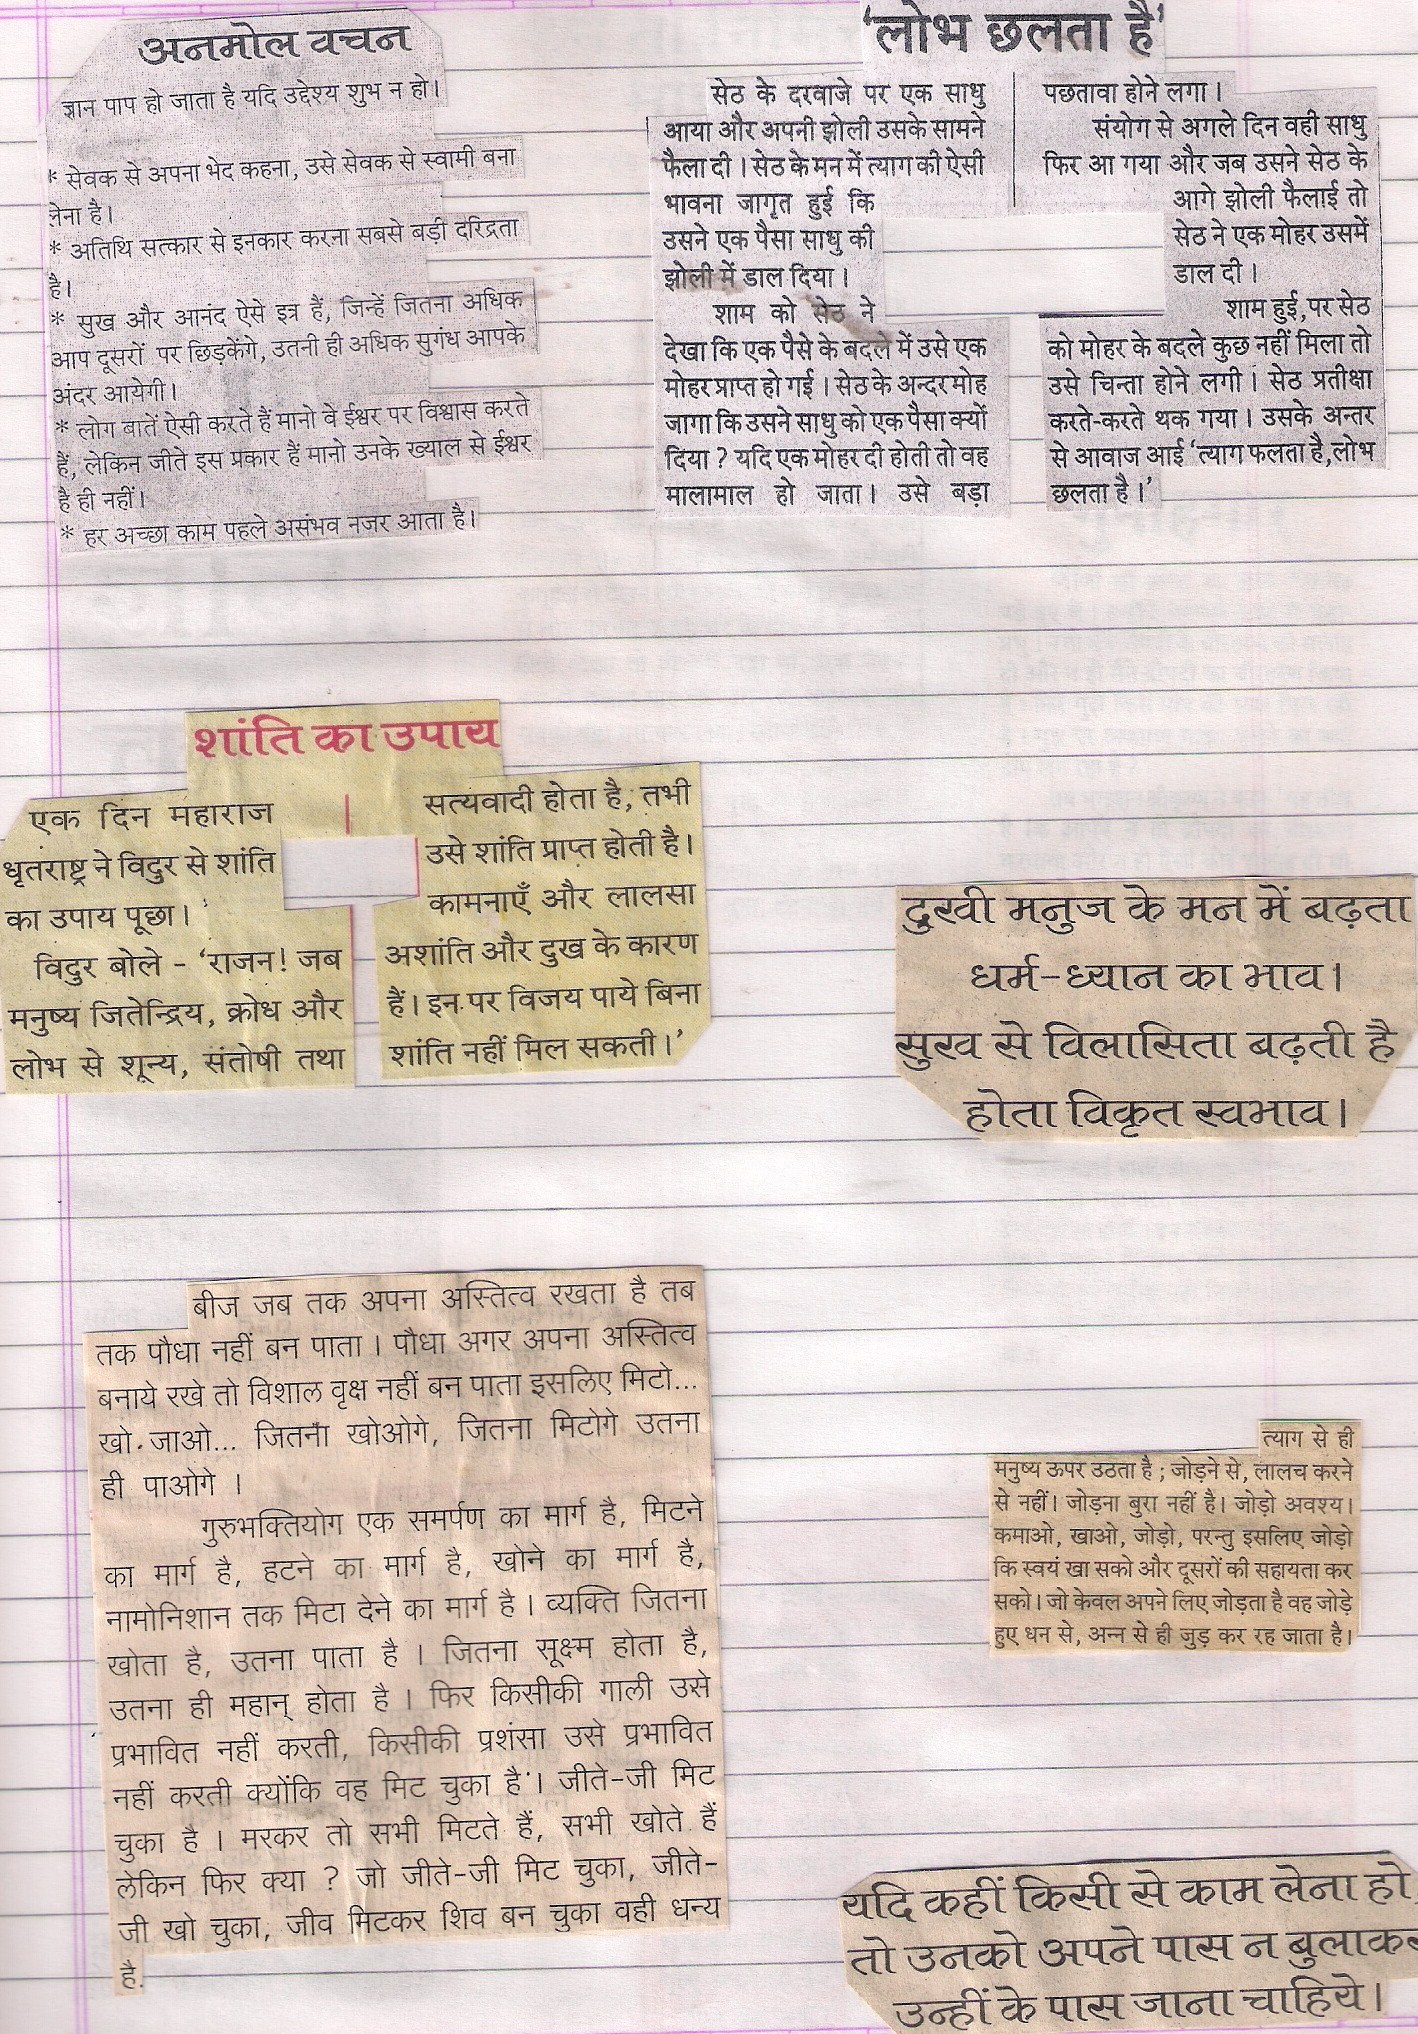 Anmol Vachan Lobh Chalta Hai Shanti Ka Upaay Hindi